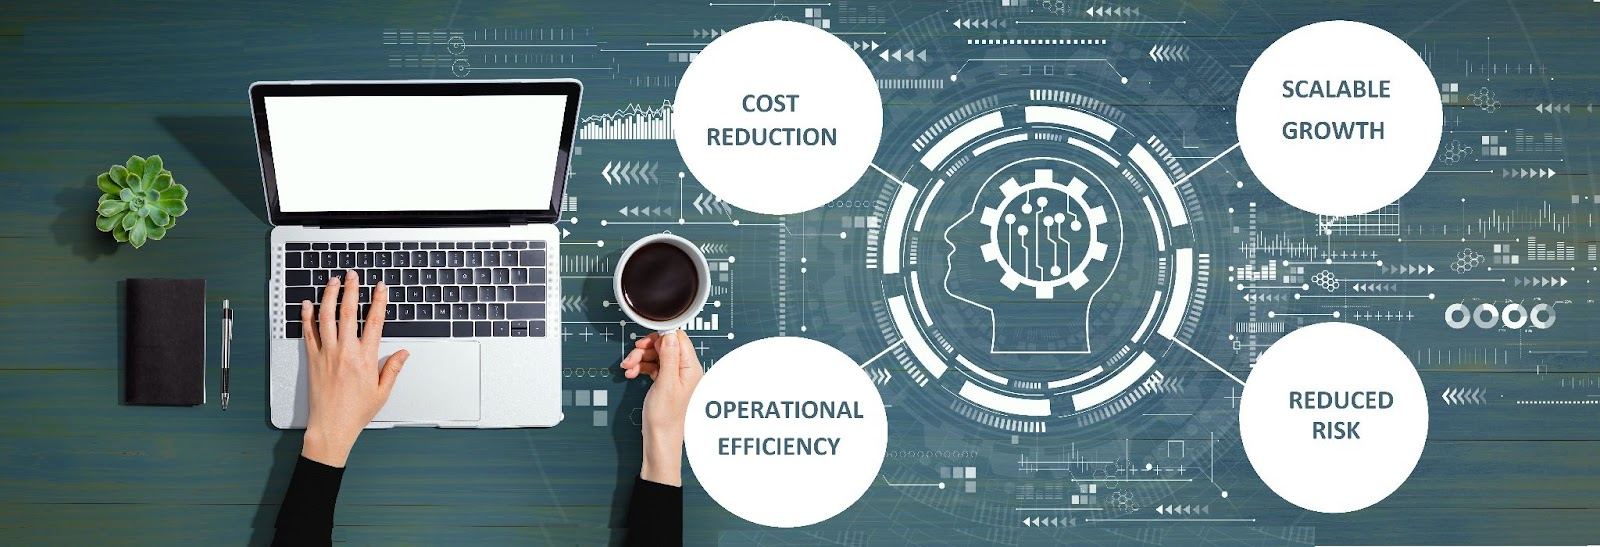 utilizing a document understanding solution